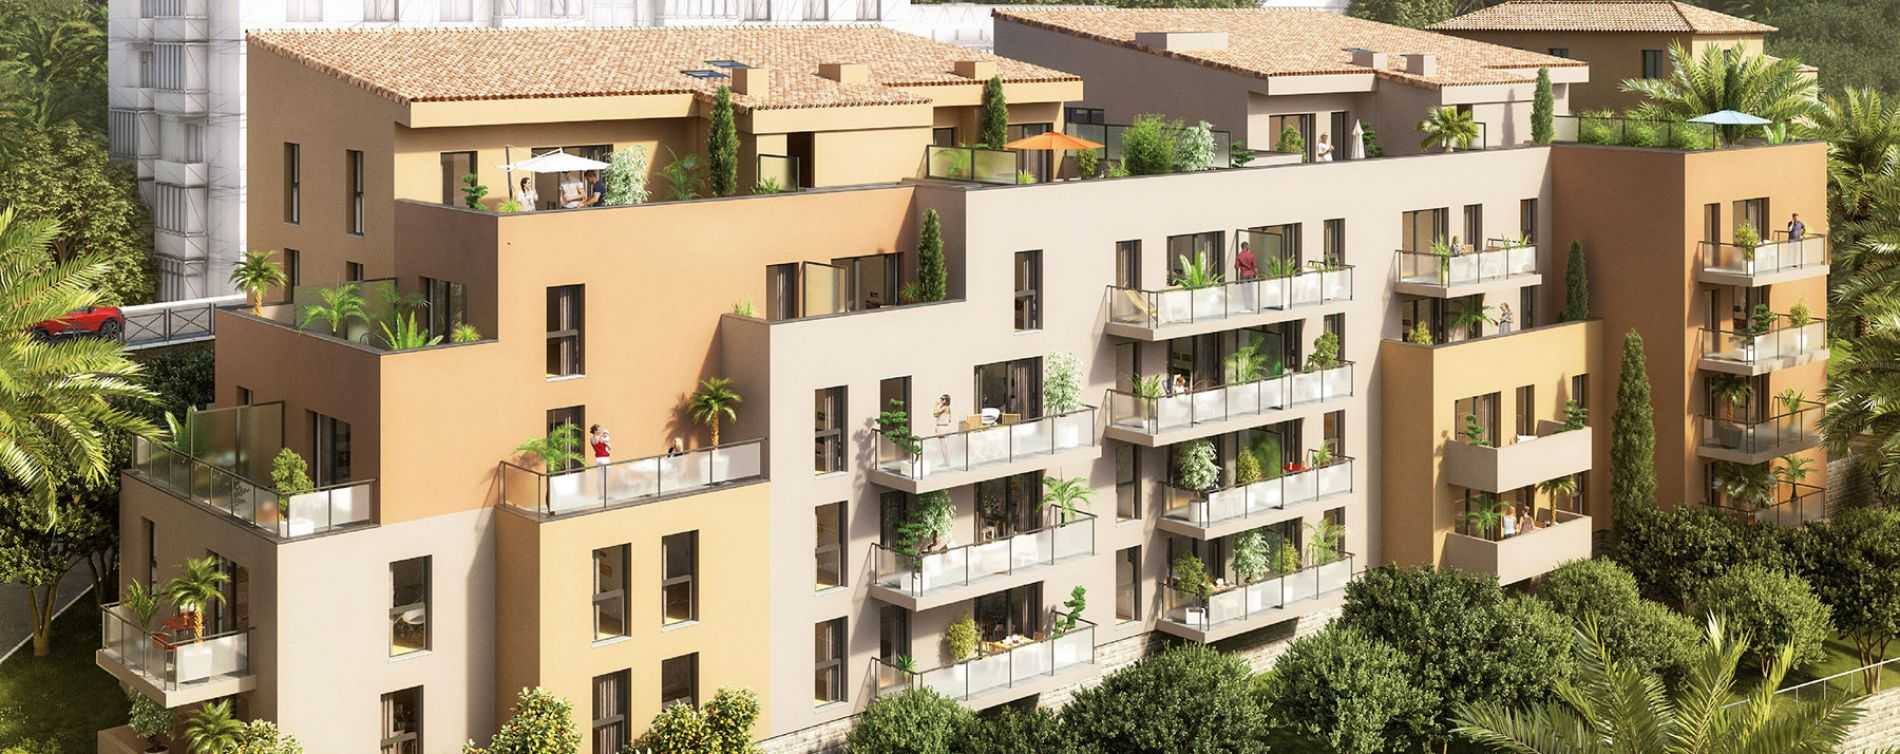 Grasse : programme immobilier neuve « Villa Pauline »